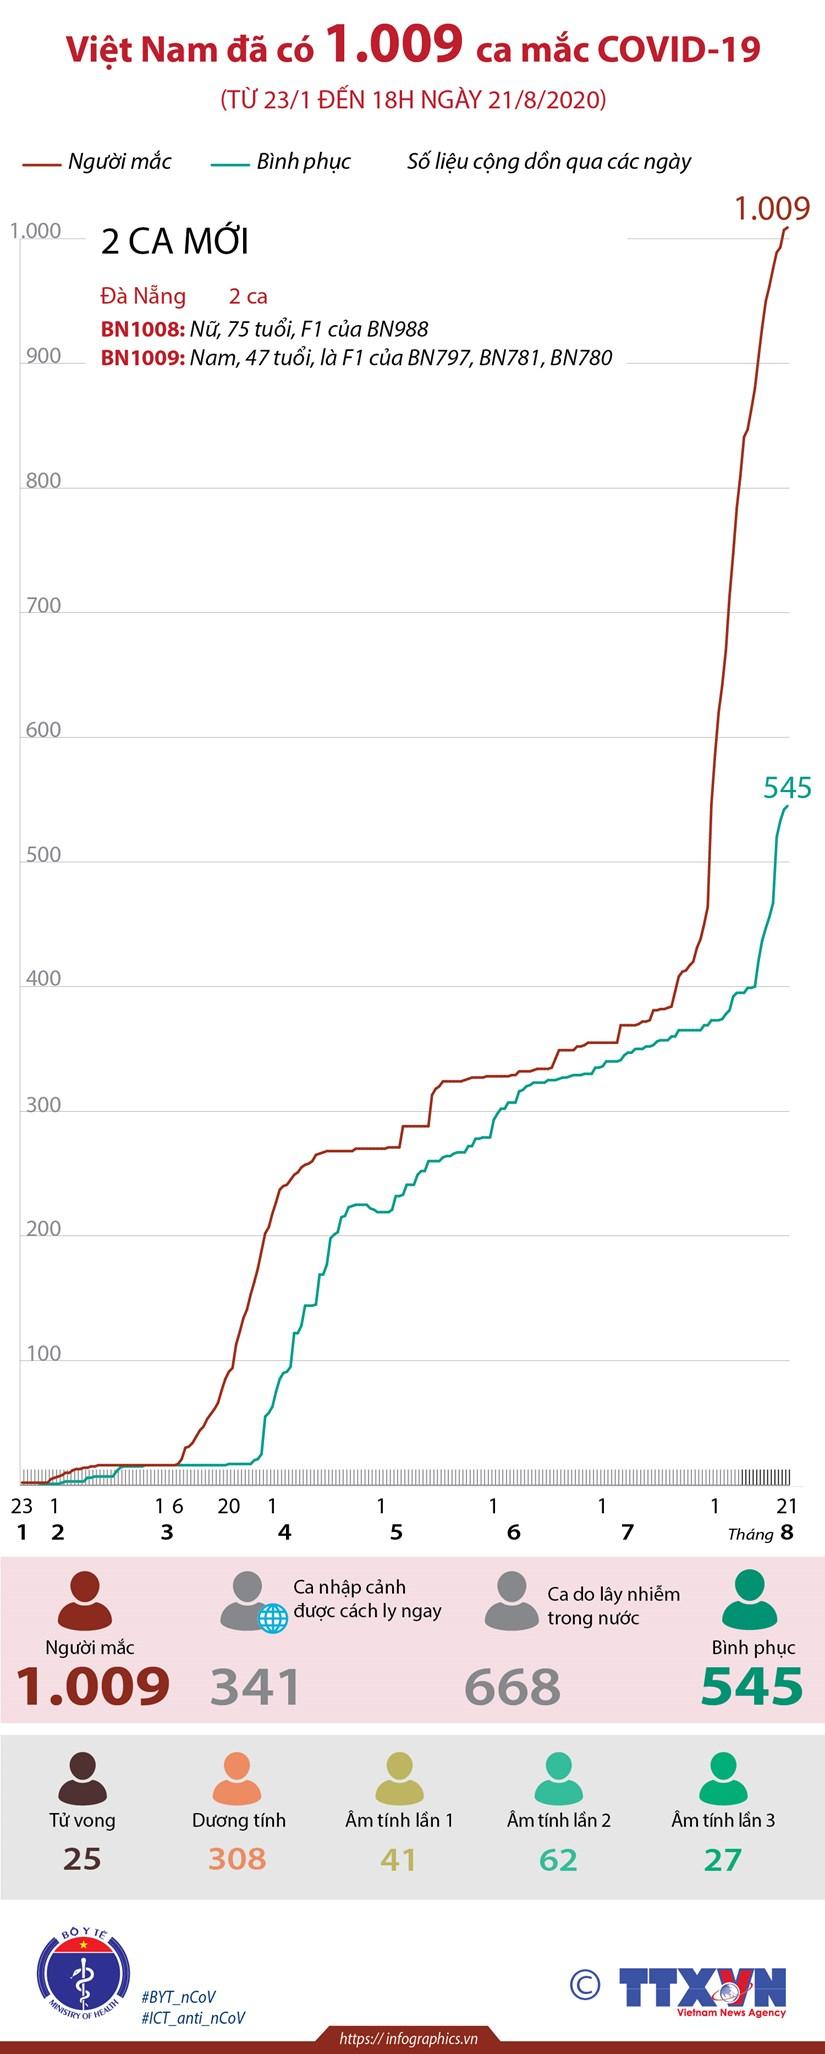 [Infographics] Viet Nam da ghi nhan 1.009 ca mac COVID-19 hinh anh 1